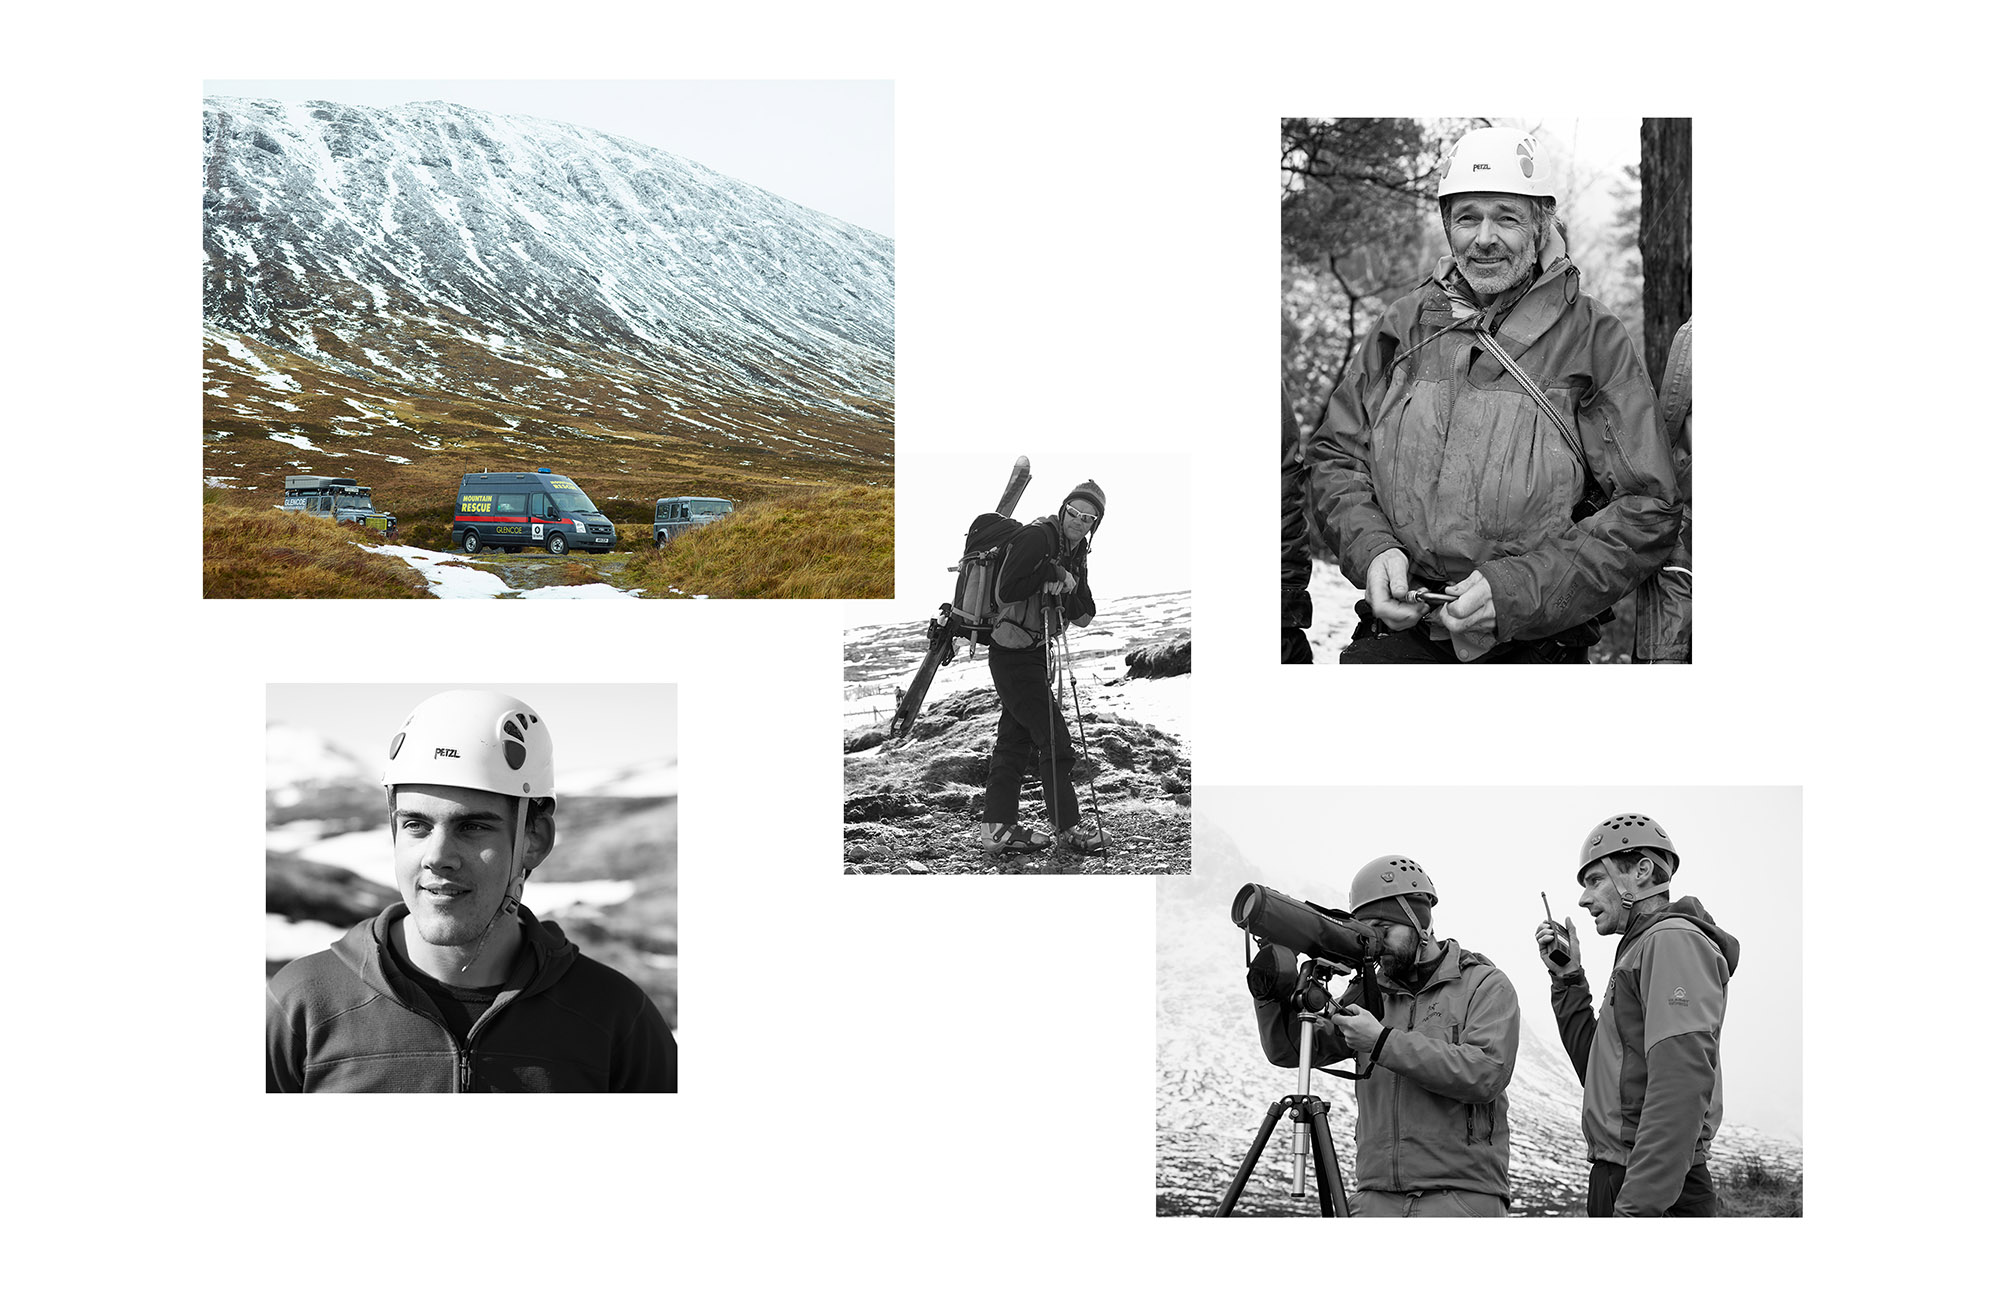 Hole and Corner | Glencoe Rescue Team - 12 of 14